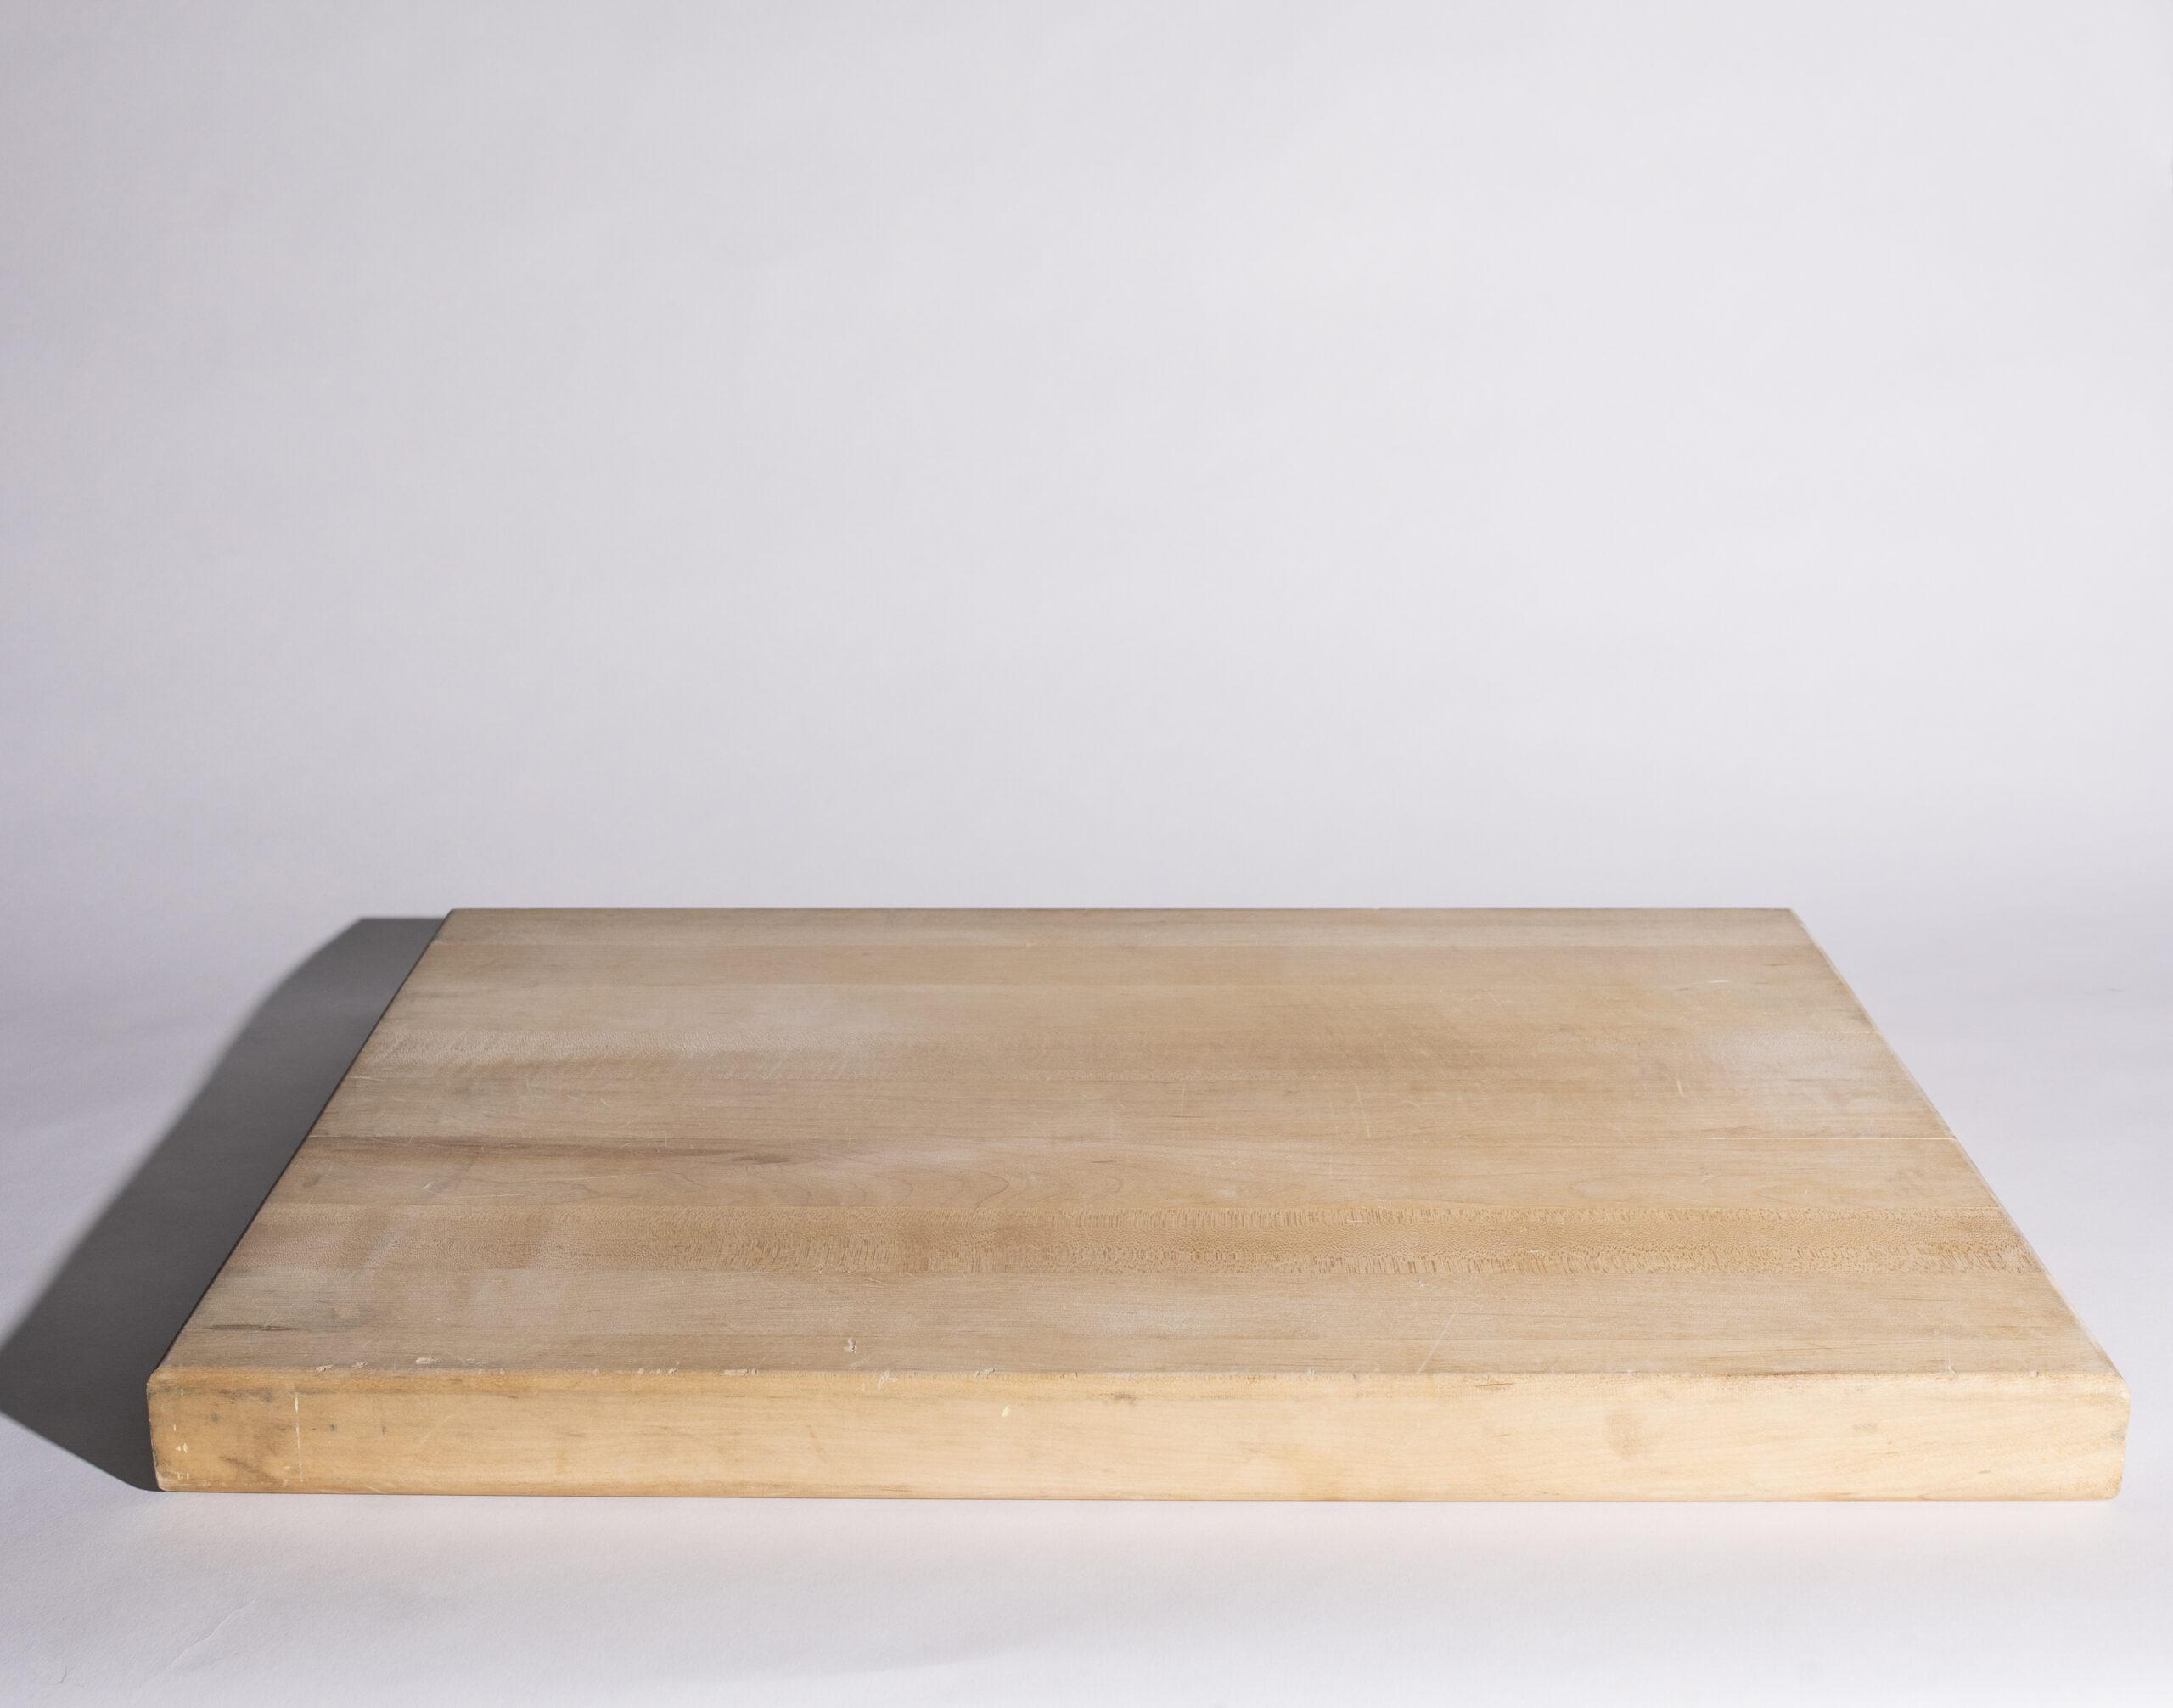 Cheese board (18''X24'', wood)